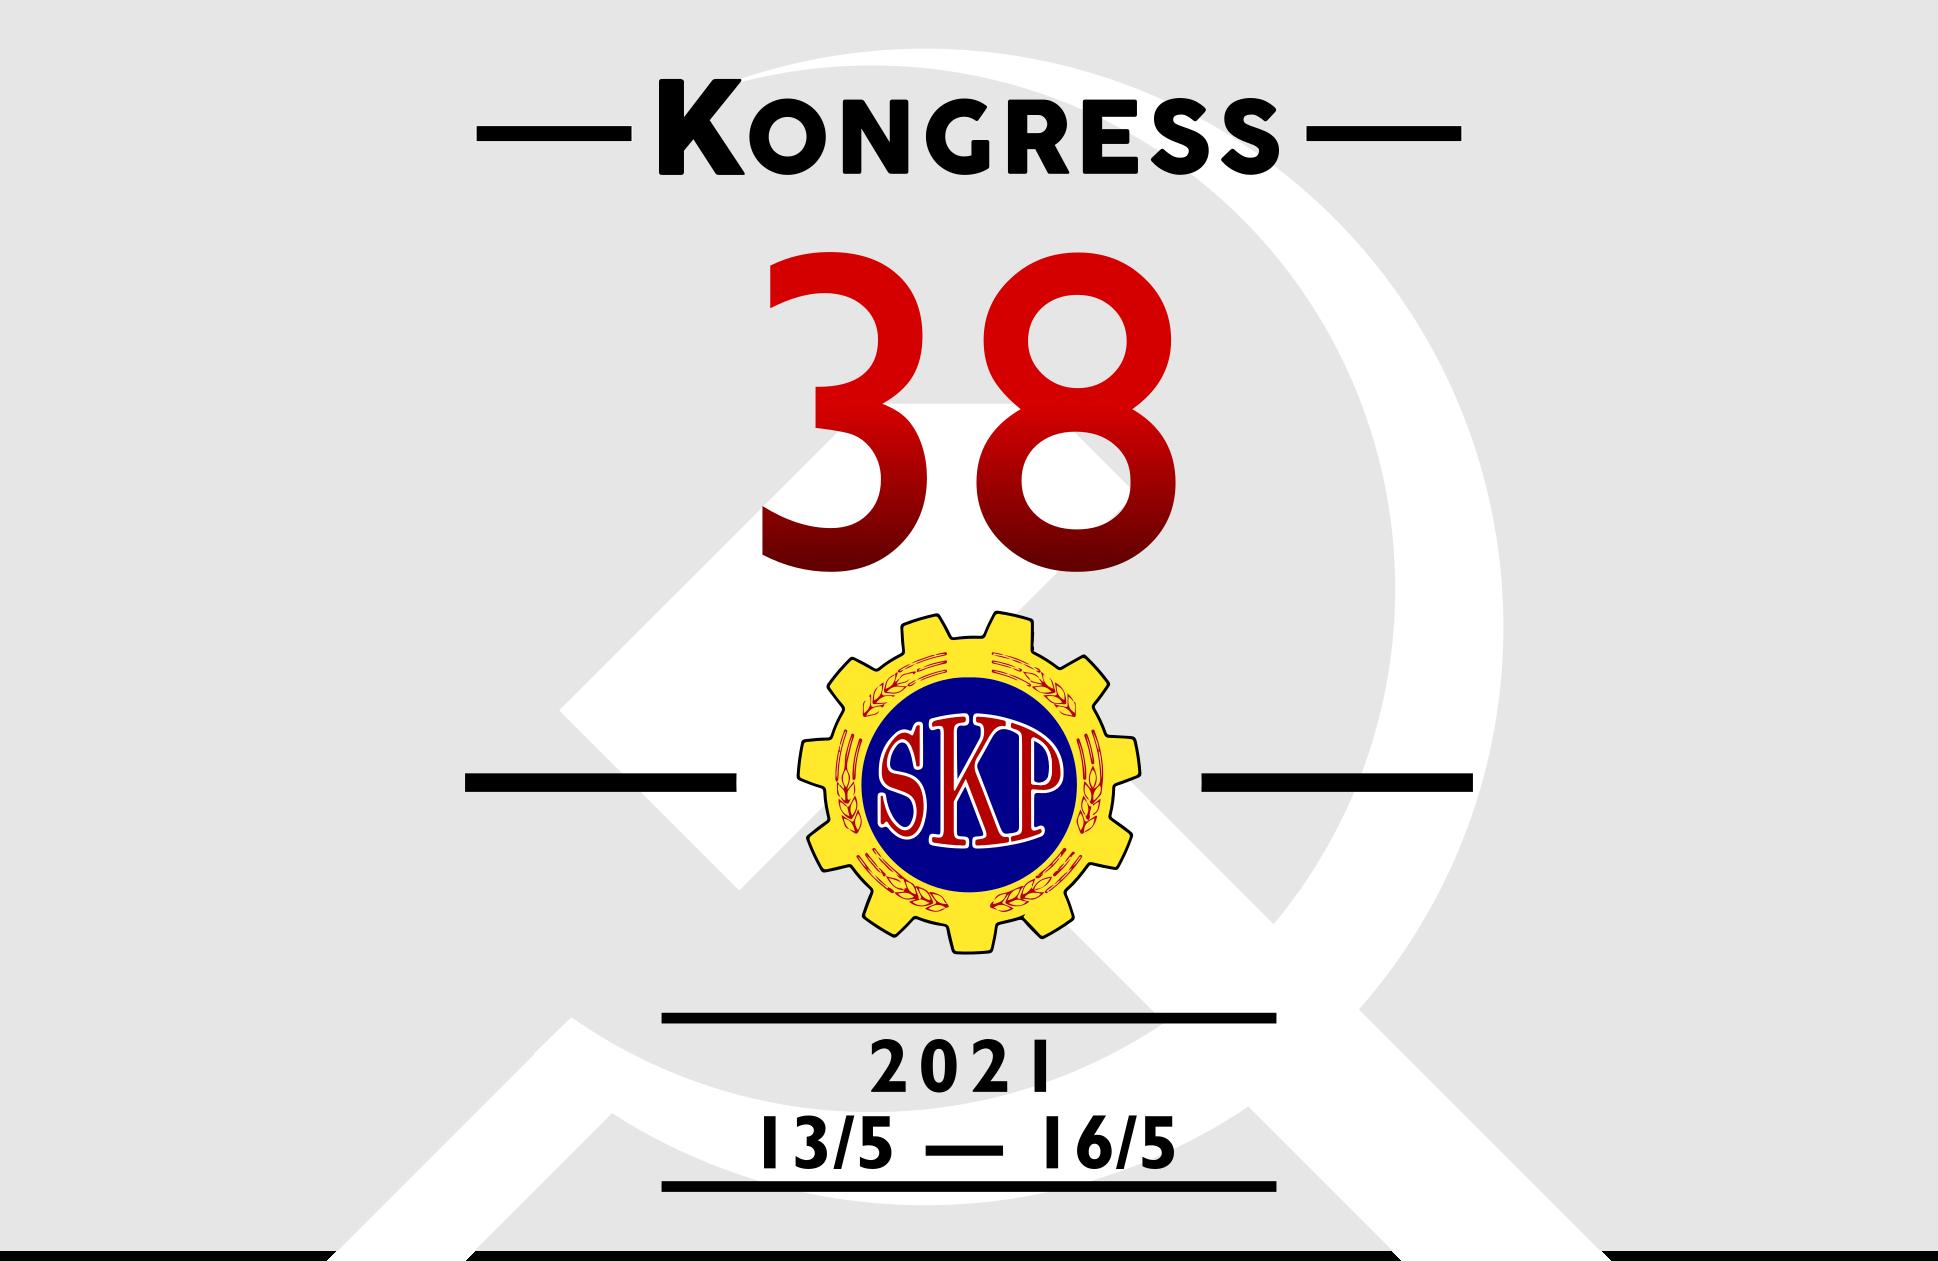 Sveriges Kommunistiska Partis 38:e kongress.